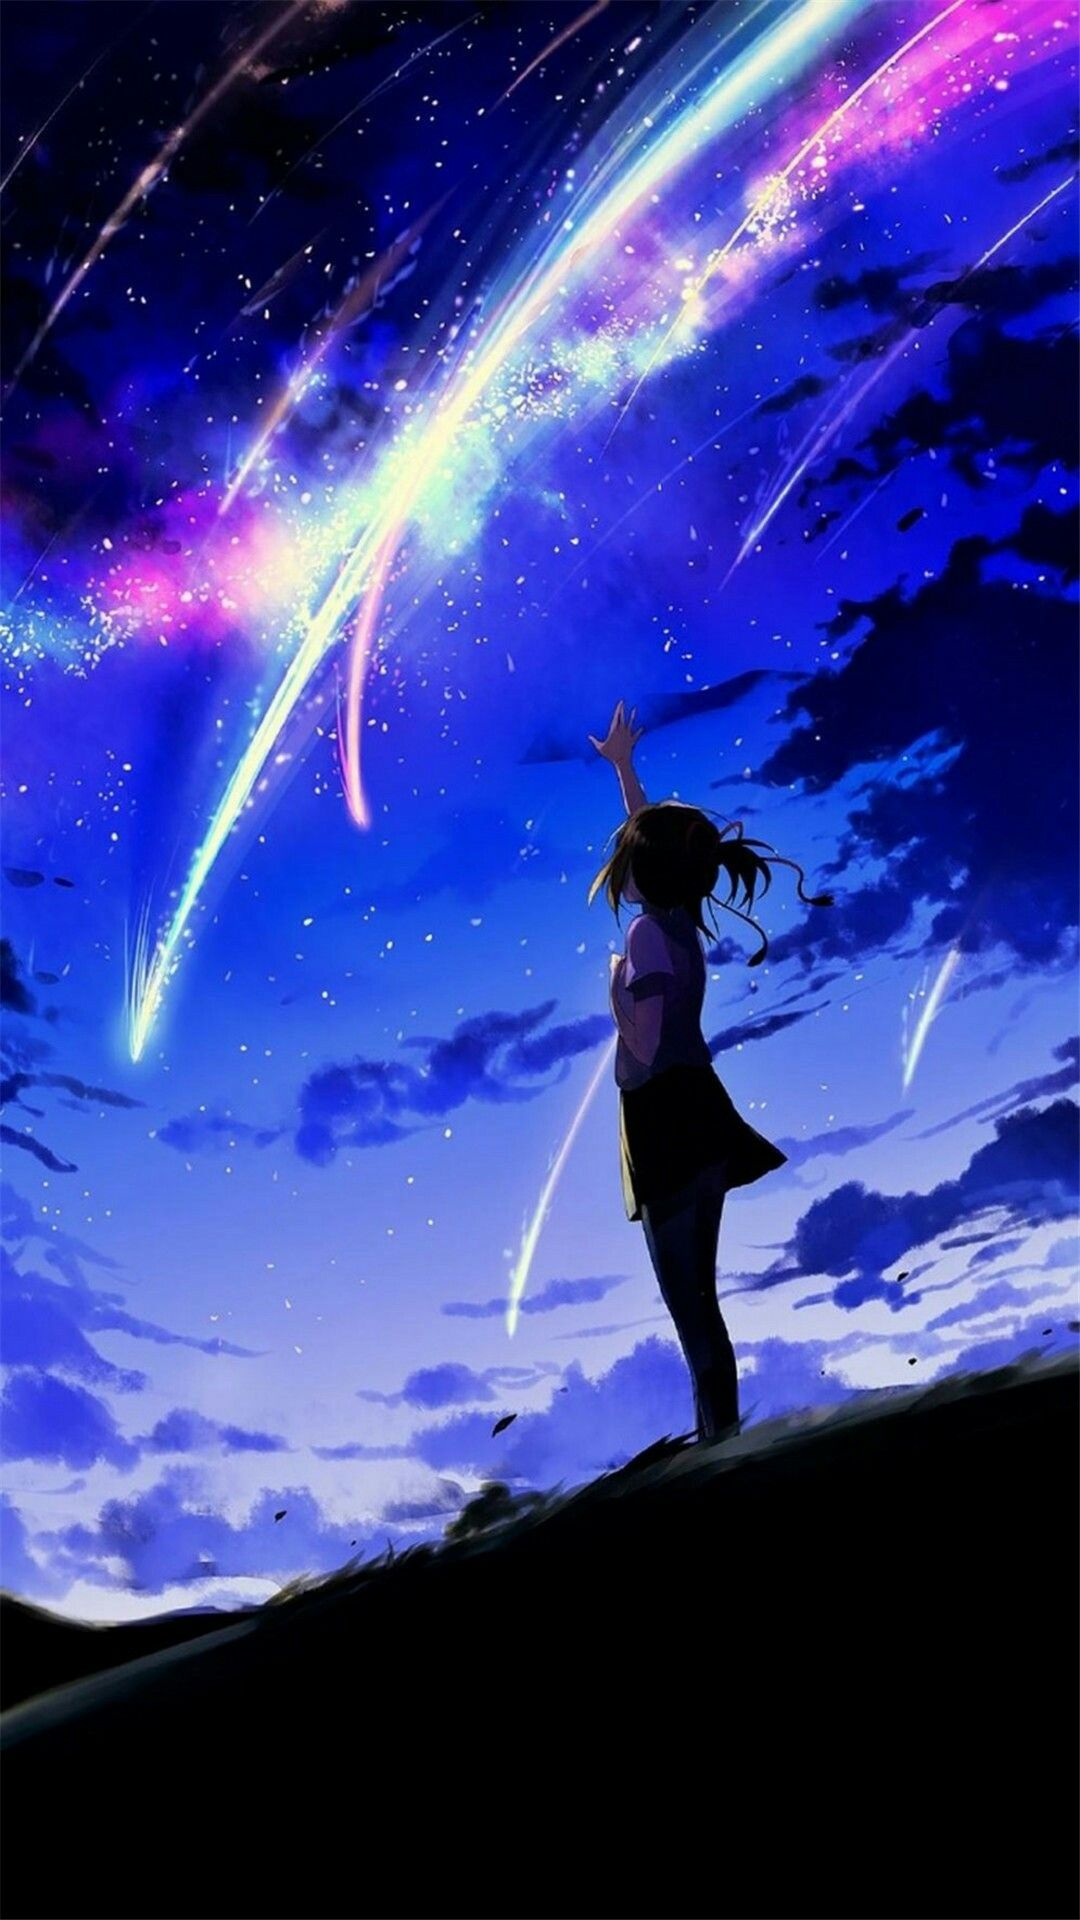 Pin By R Mk On G A L E R I A In 2020 Anime Galaxy Kimi No Na Wa Your Name Anime